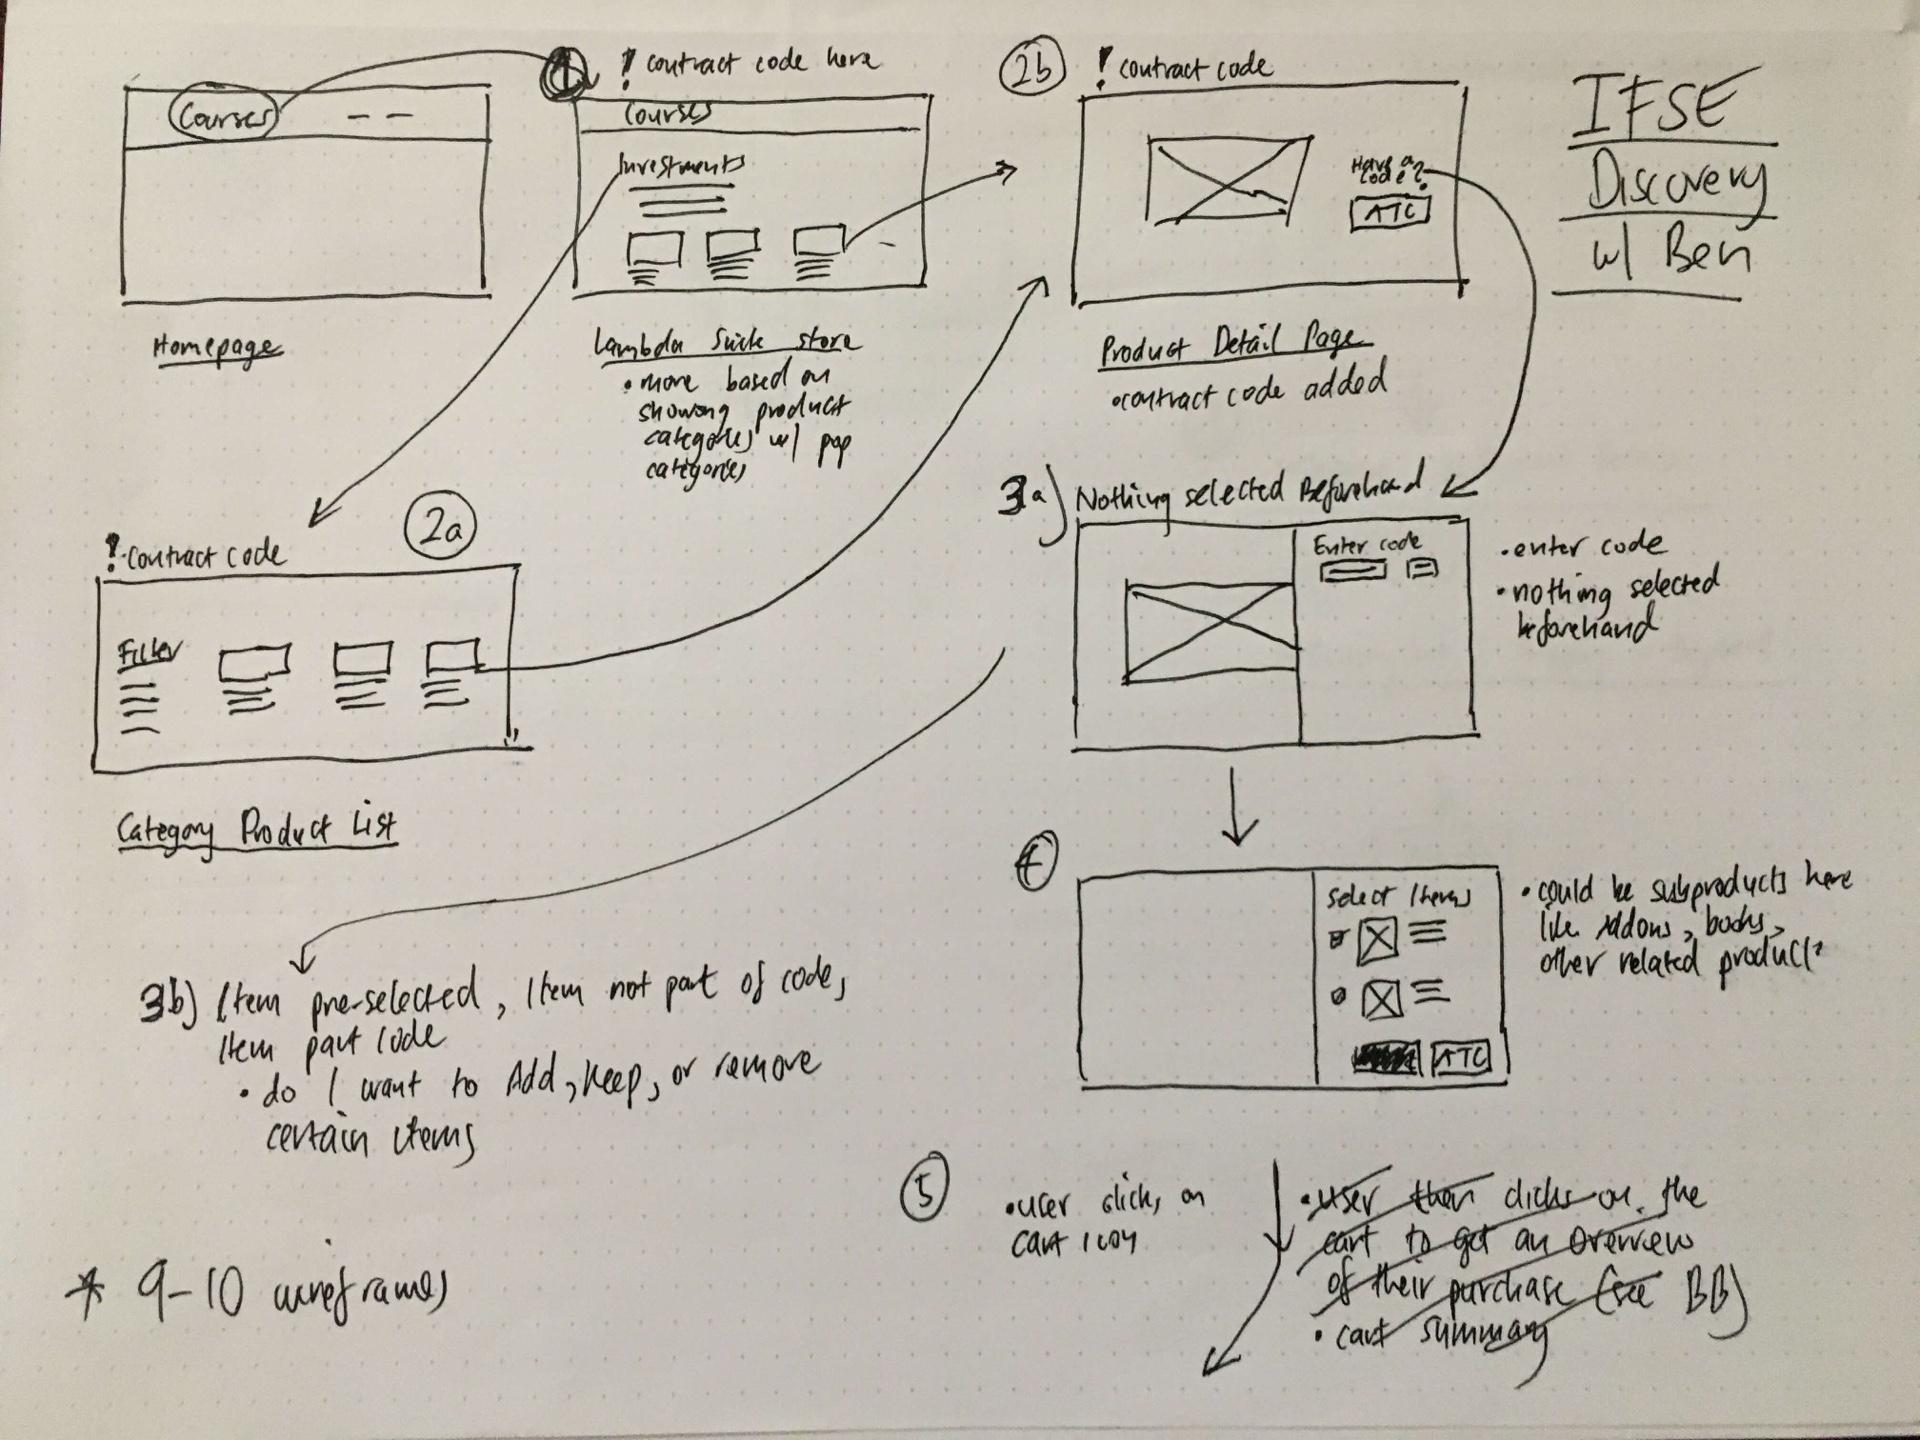 sketch-user-flow-1